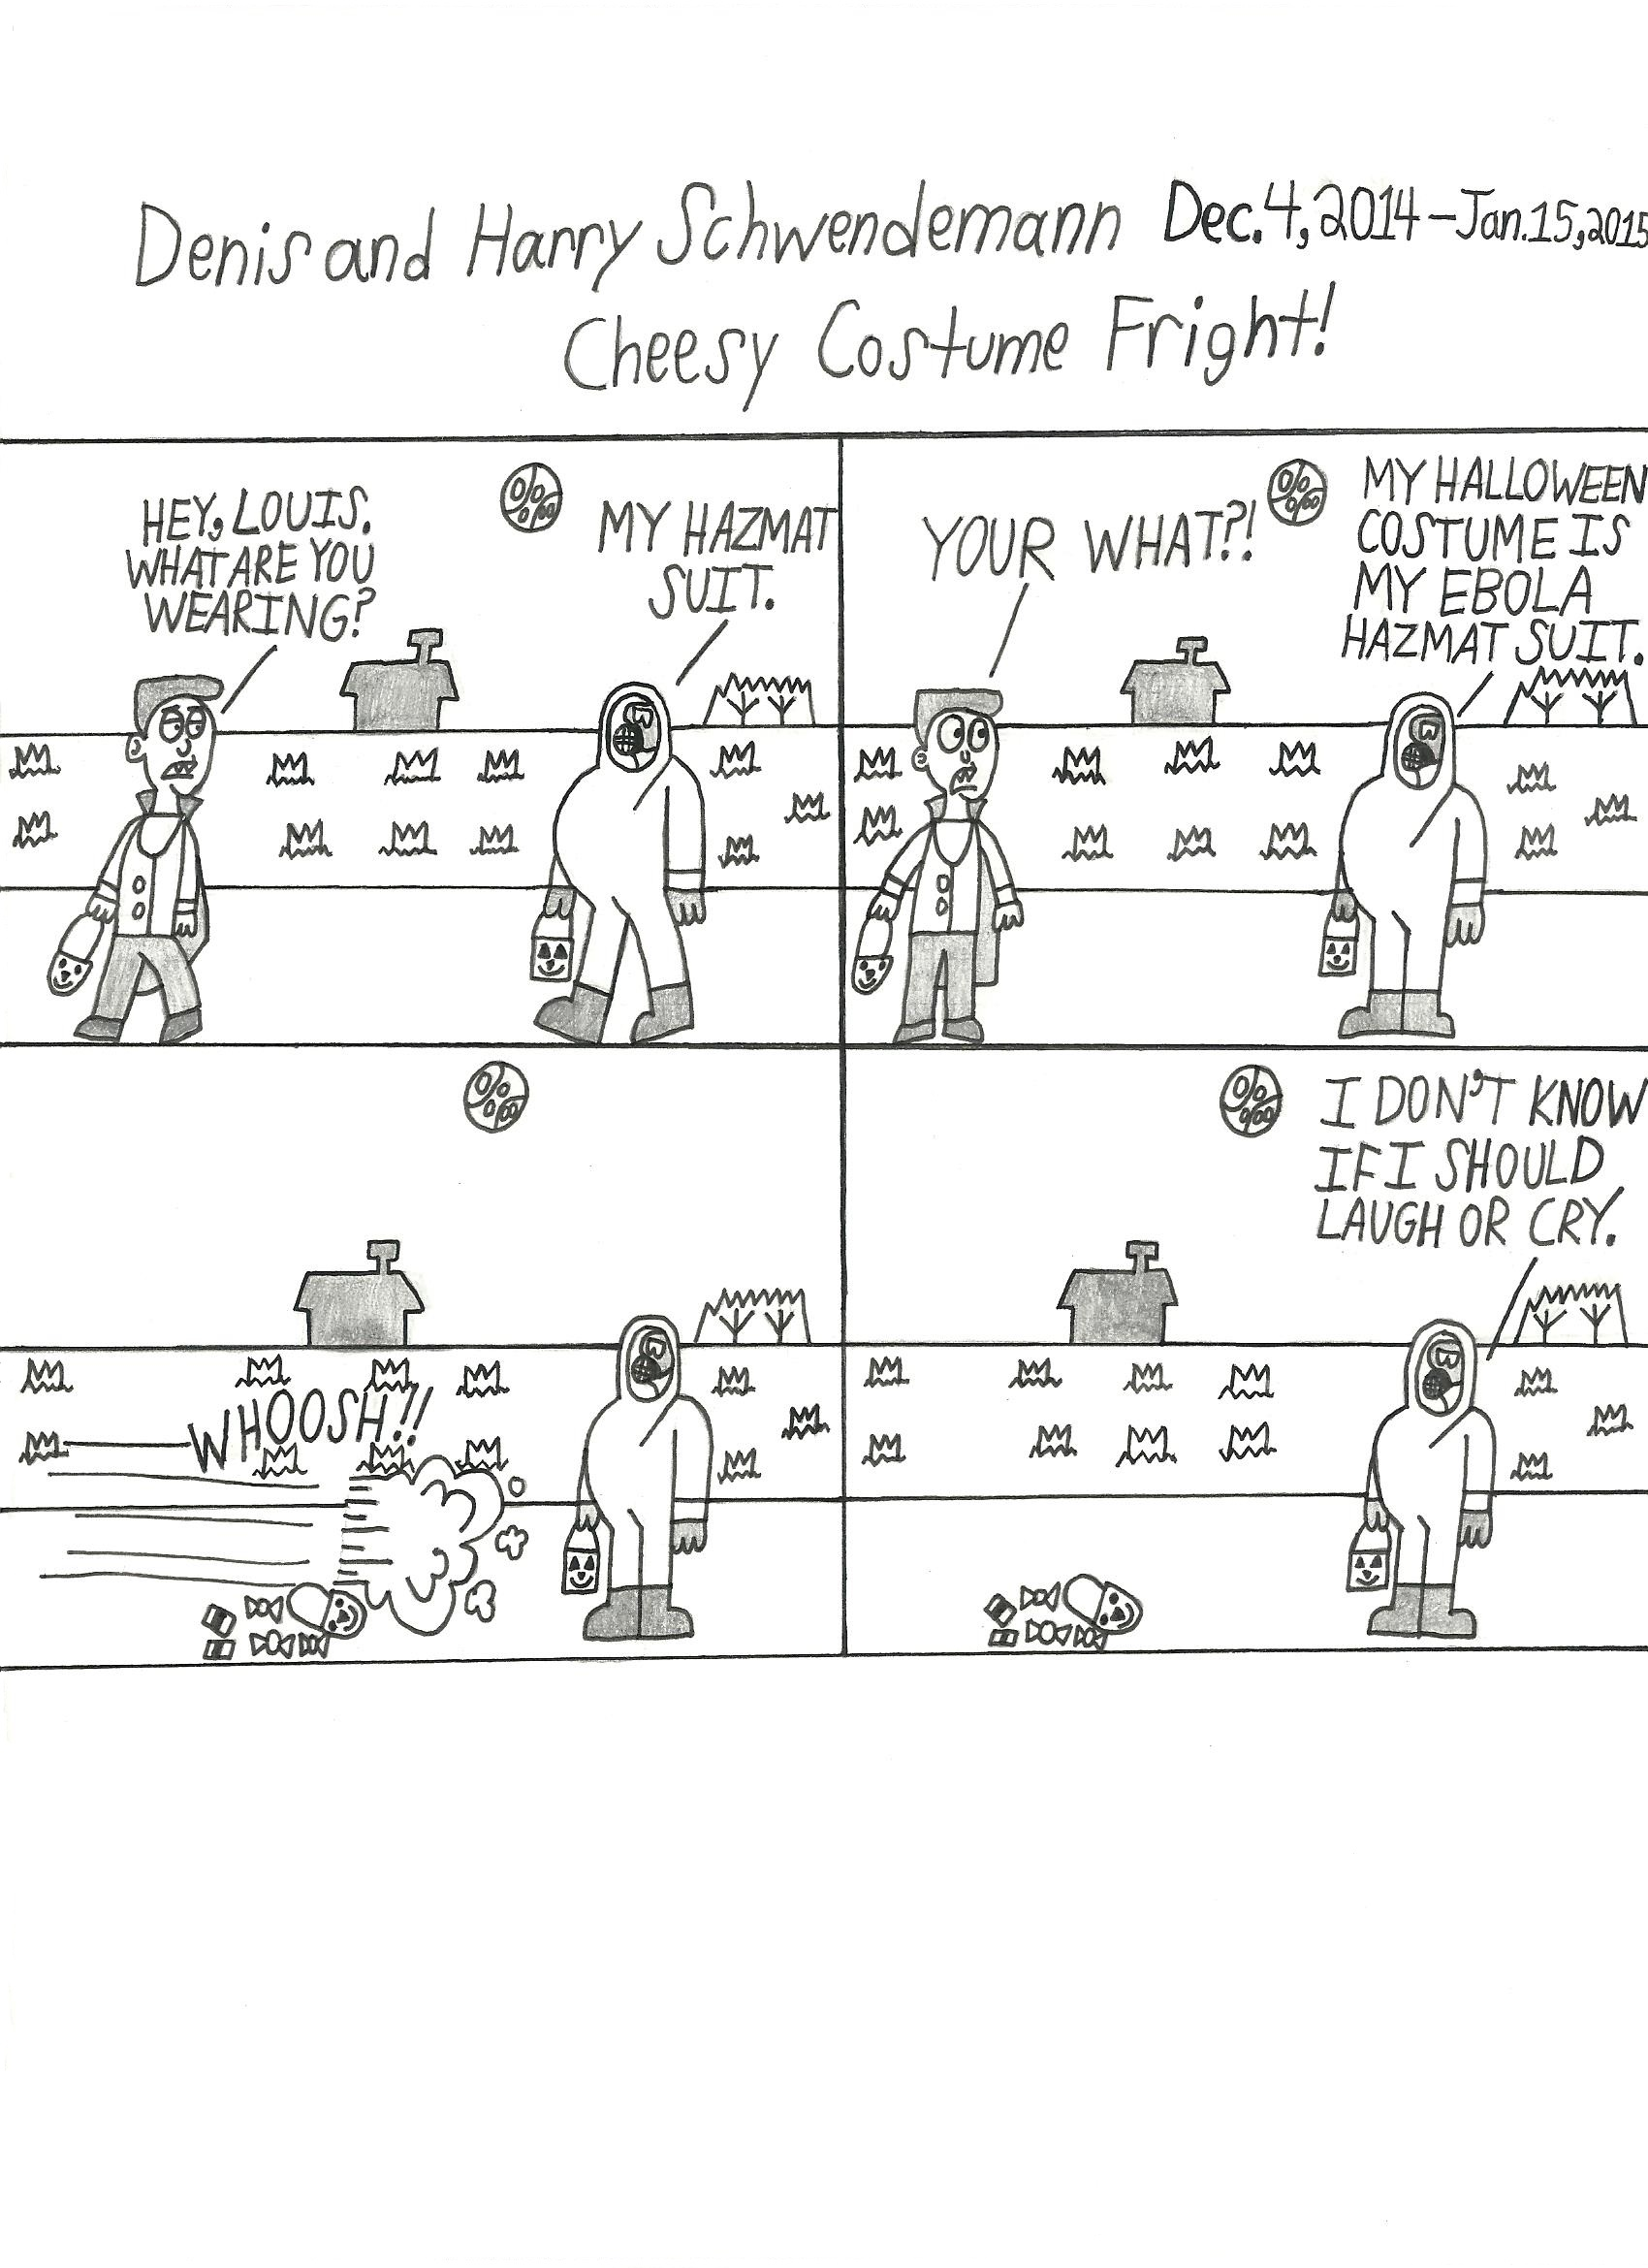 Chessy Costume Fright